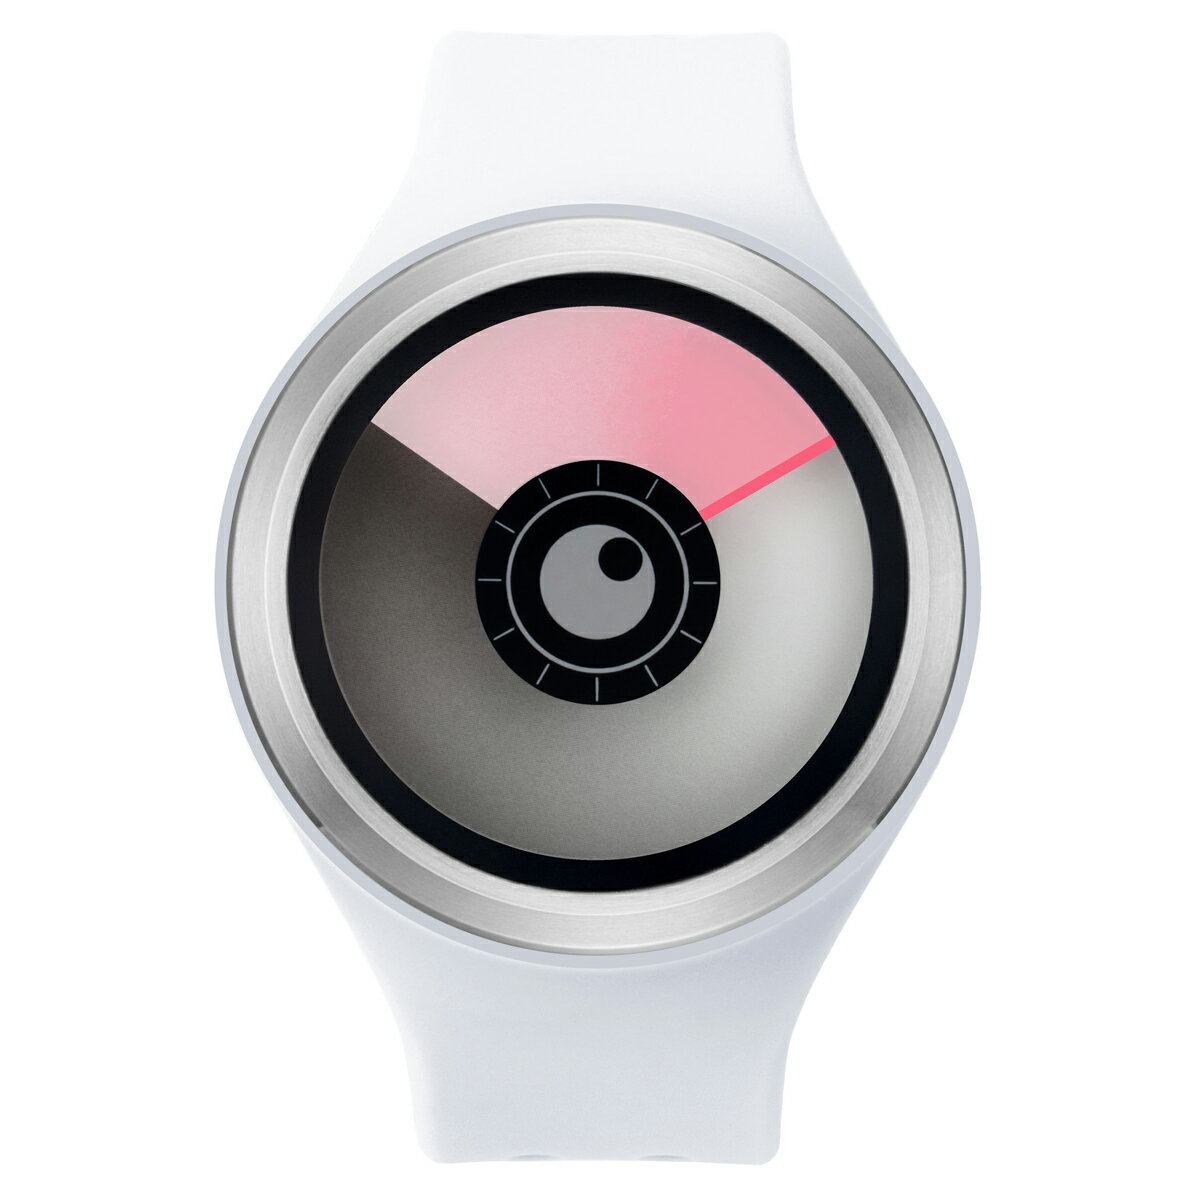 ZEROO AURORA BOREALIS ゼロ 電池式クォーツ 腕時計 [W00701B01SR01] ホワイト デザインウォッチ ペア用 メンズ レディース ユニセックス おしゃれ時計 デザイナーズ